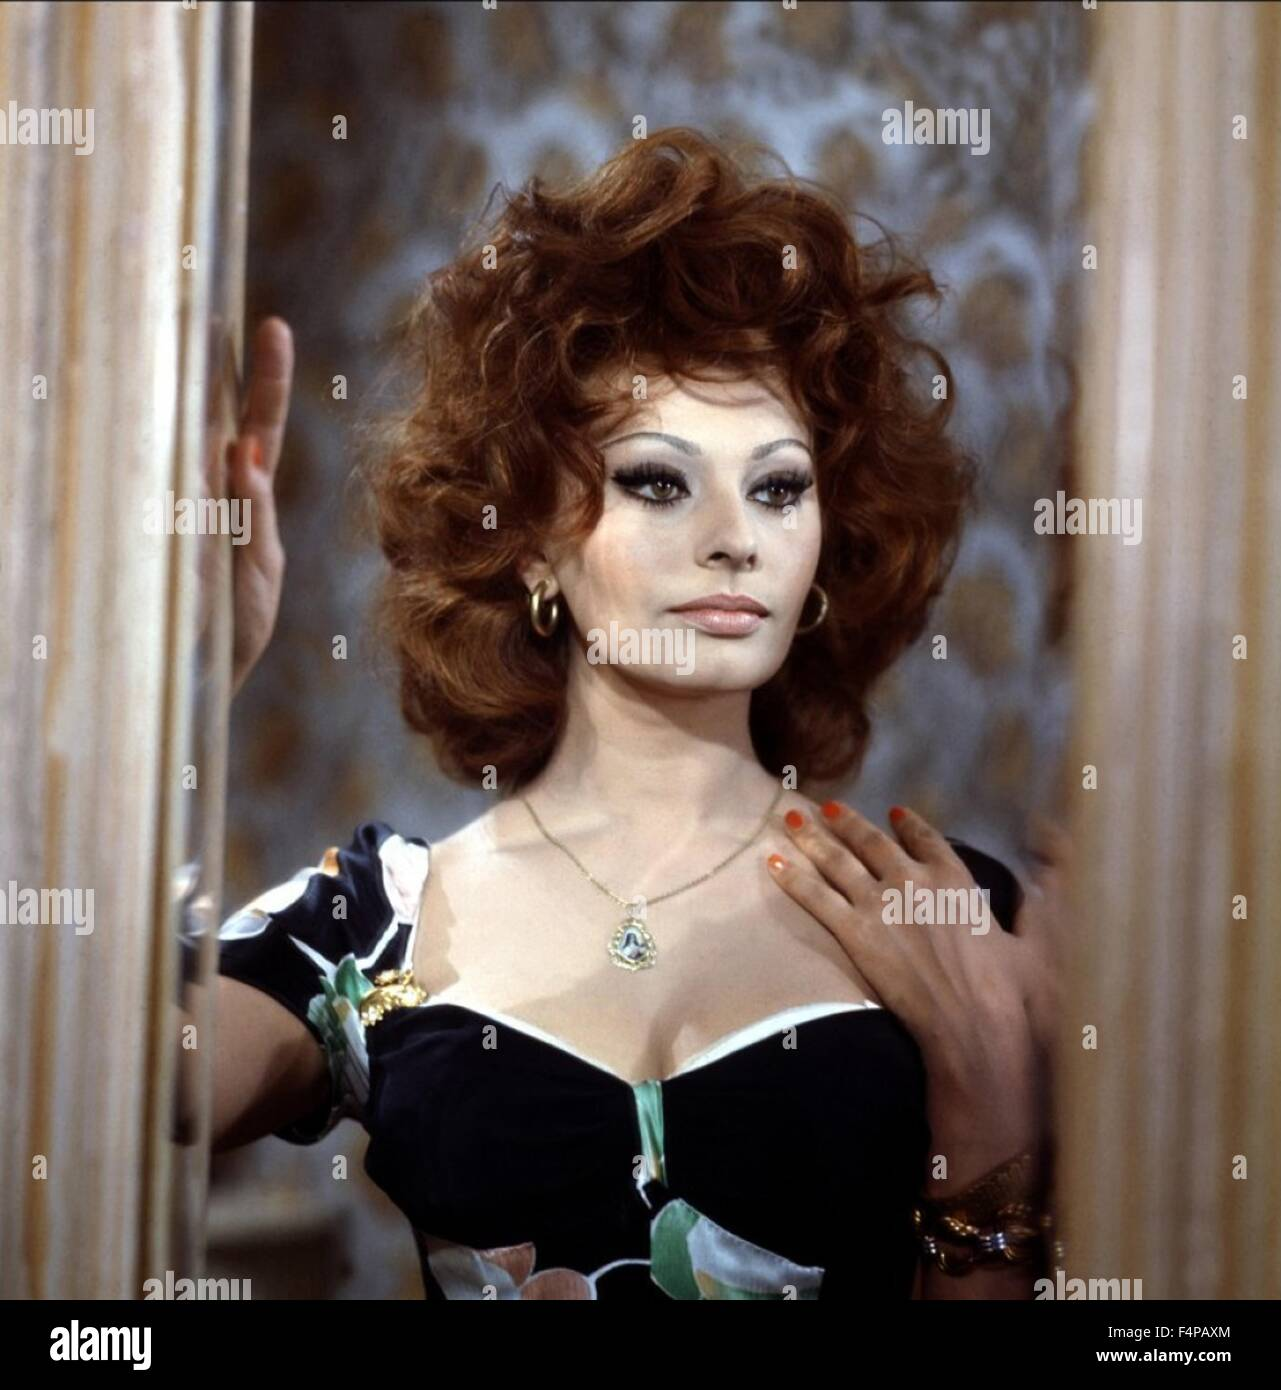 Sophia Loren / Mariage a l'Italienne 1964 directed by Vittorio De Sica - Stock Image